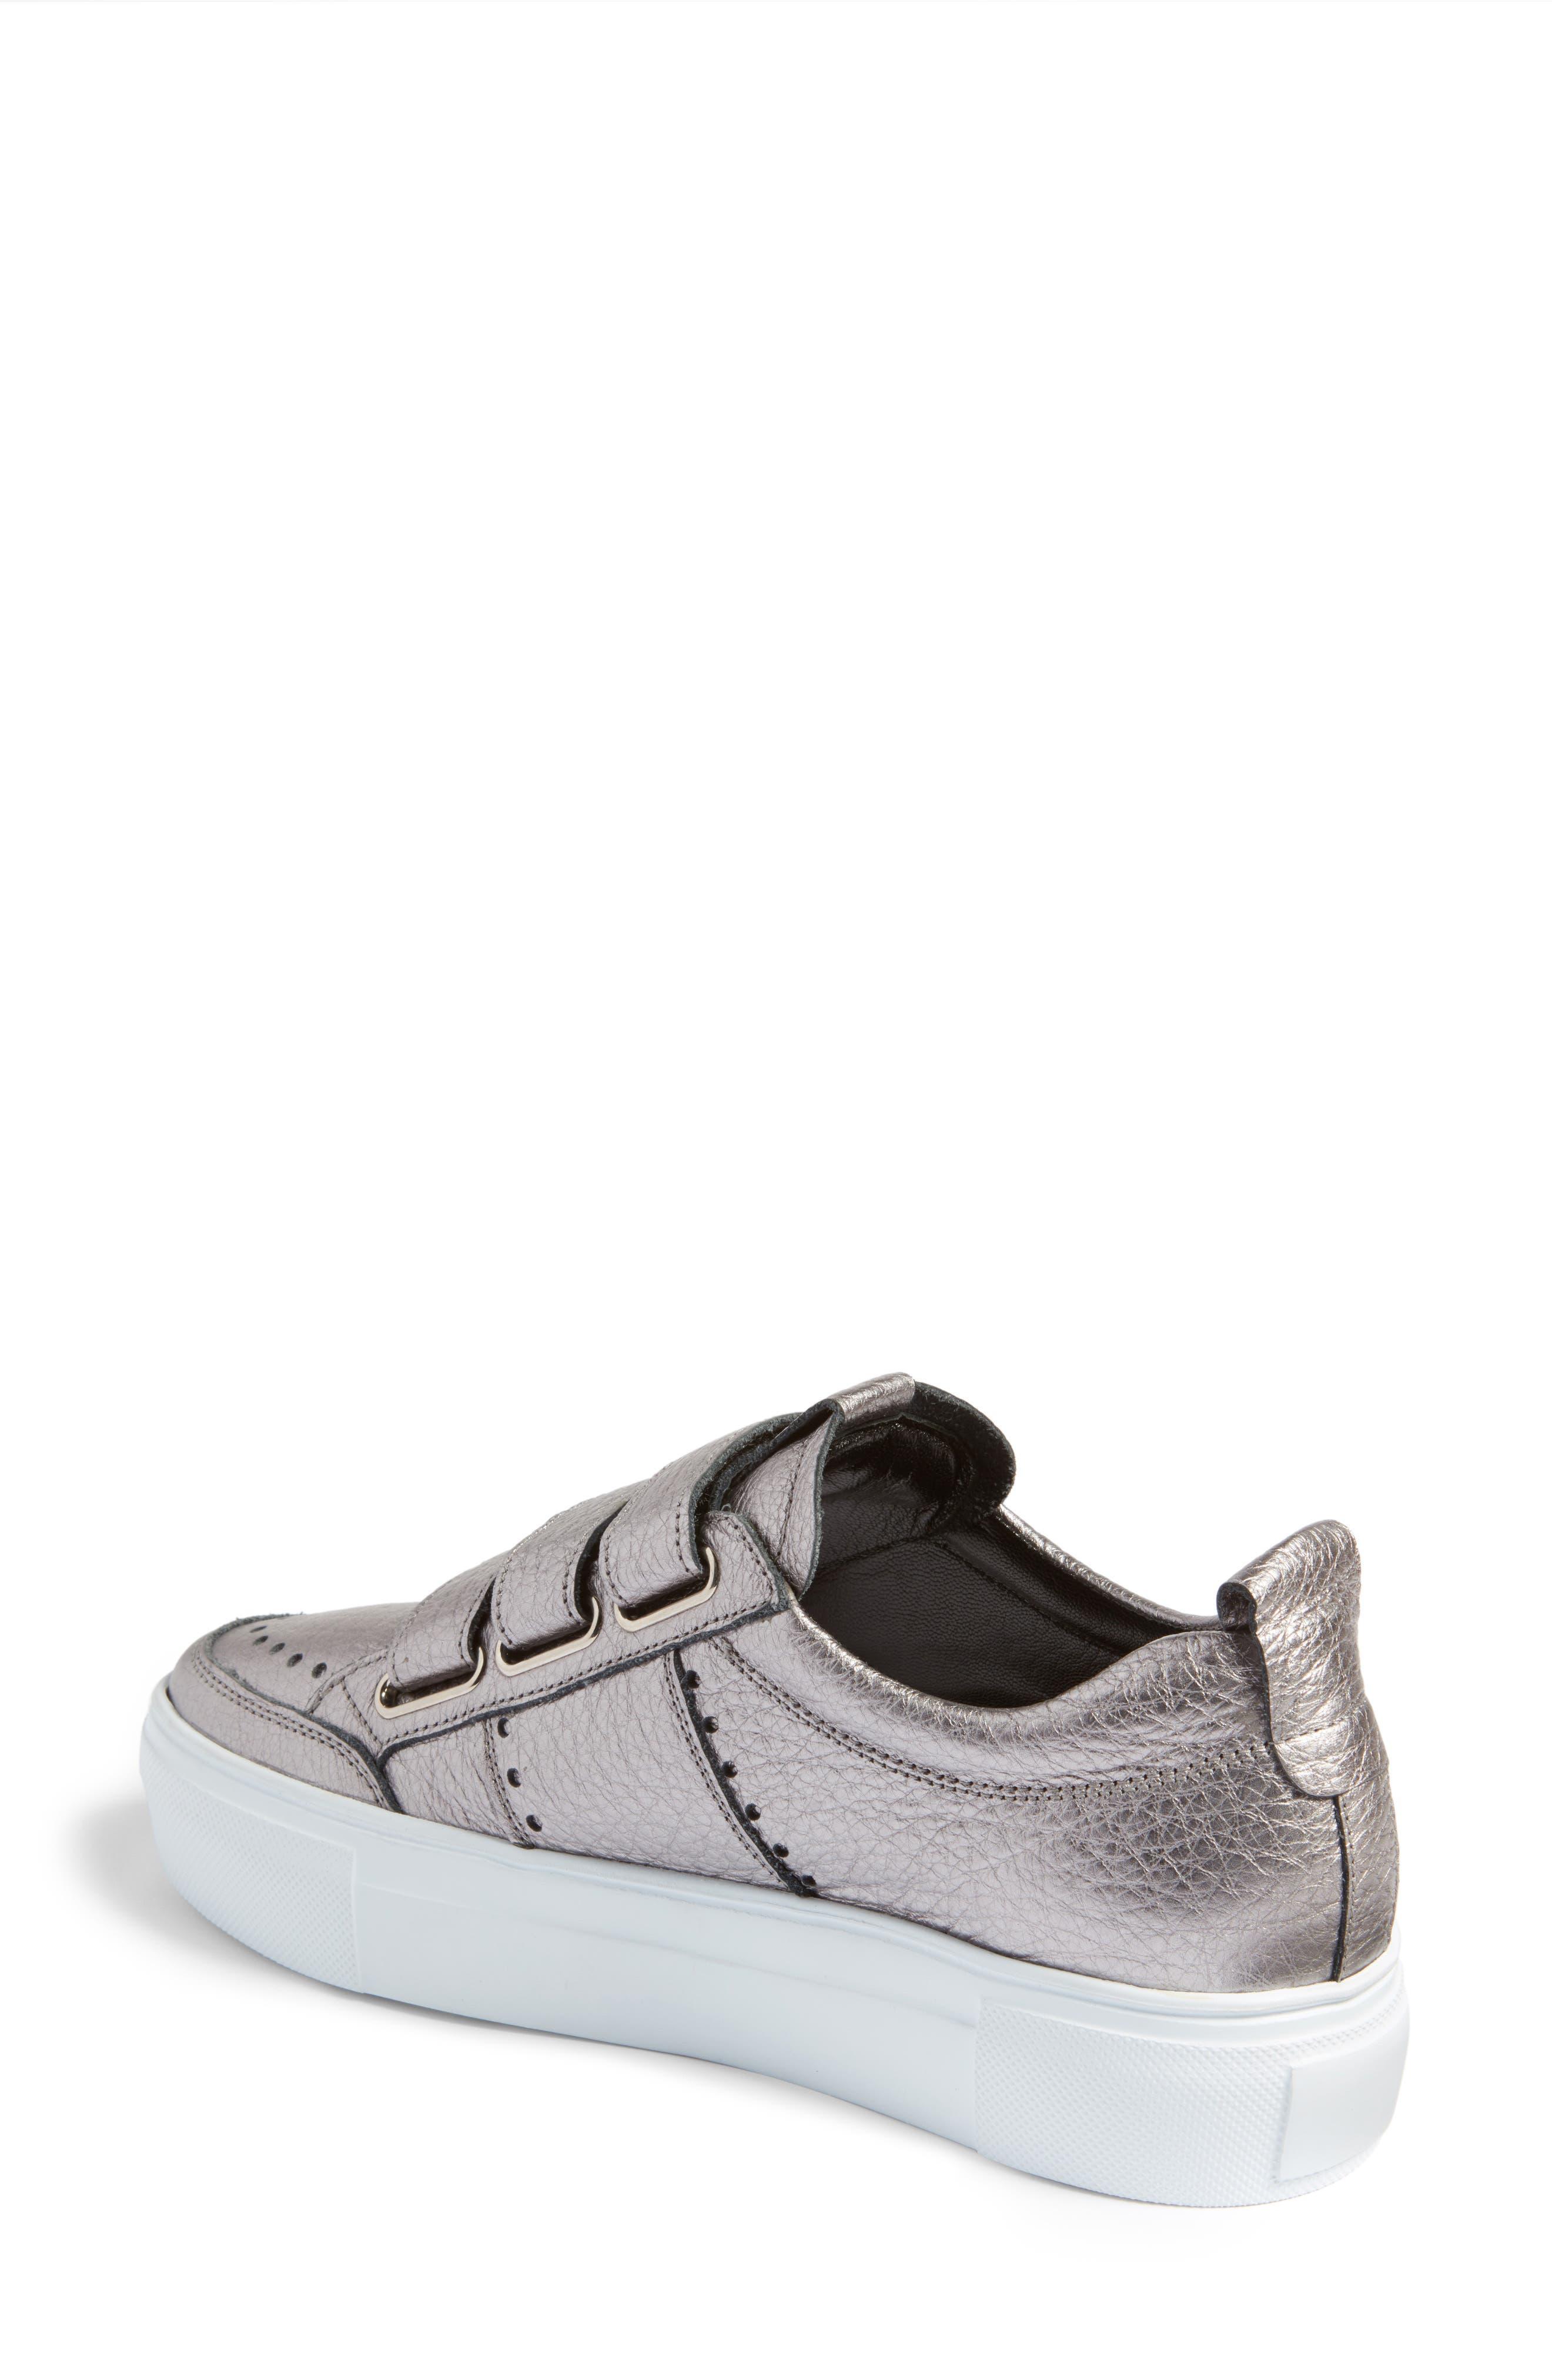 Kennel & Schmenger Big Low Top Tab Sneaker,                             Alternate thumbnail 2, color,                             020